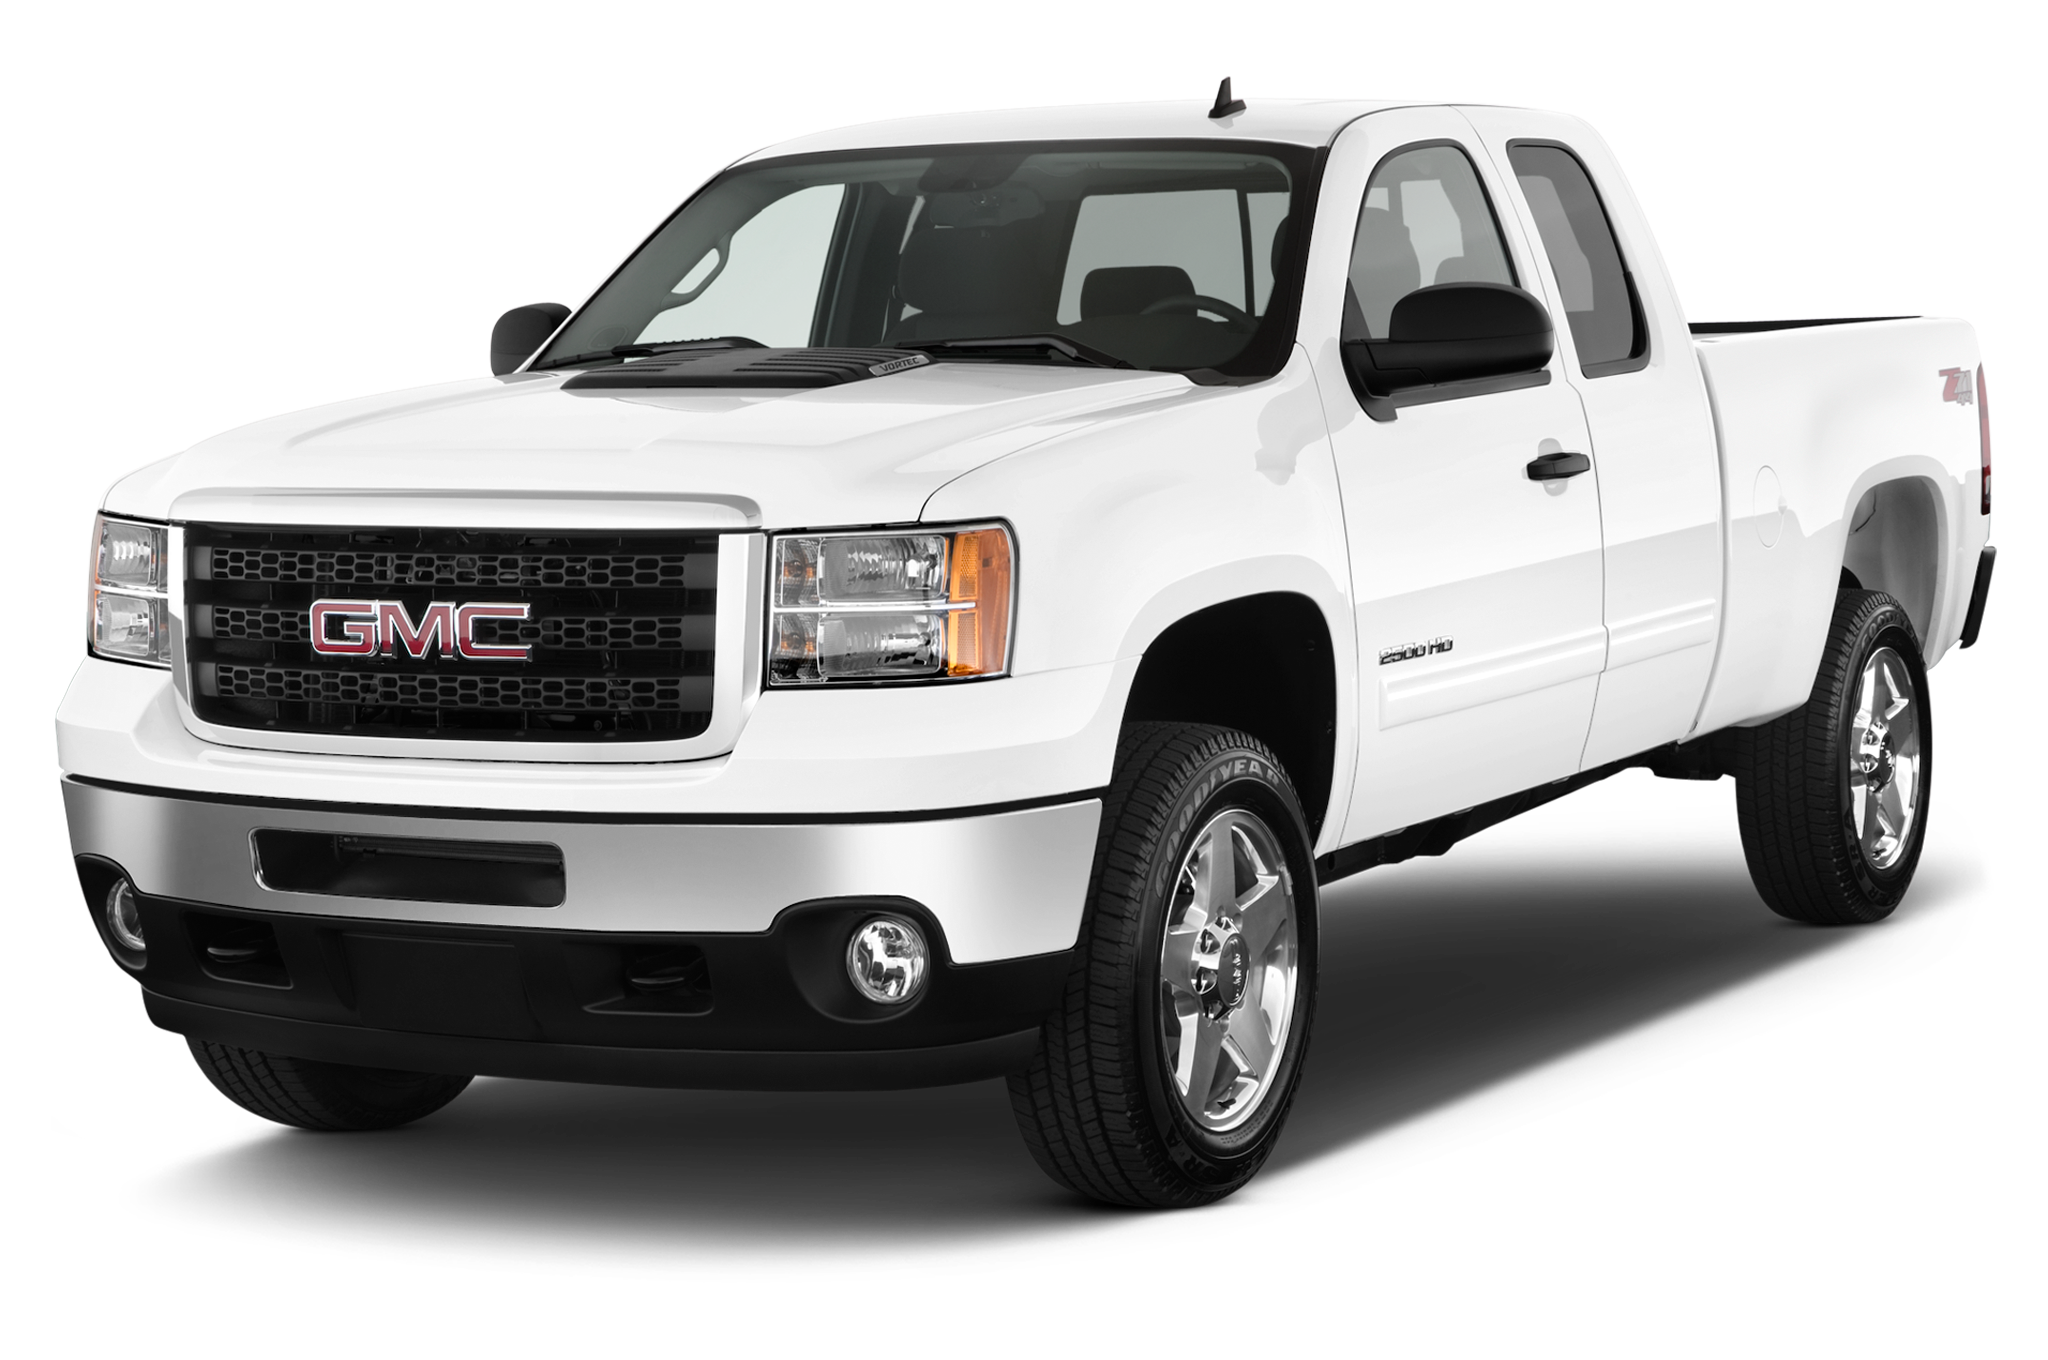 2011 GMC Sierra Denali Heavy Duty - GMC Fullsize Pickup Truck - Automobile Magazine